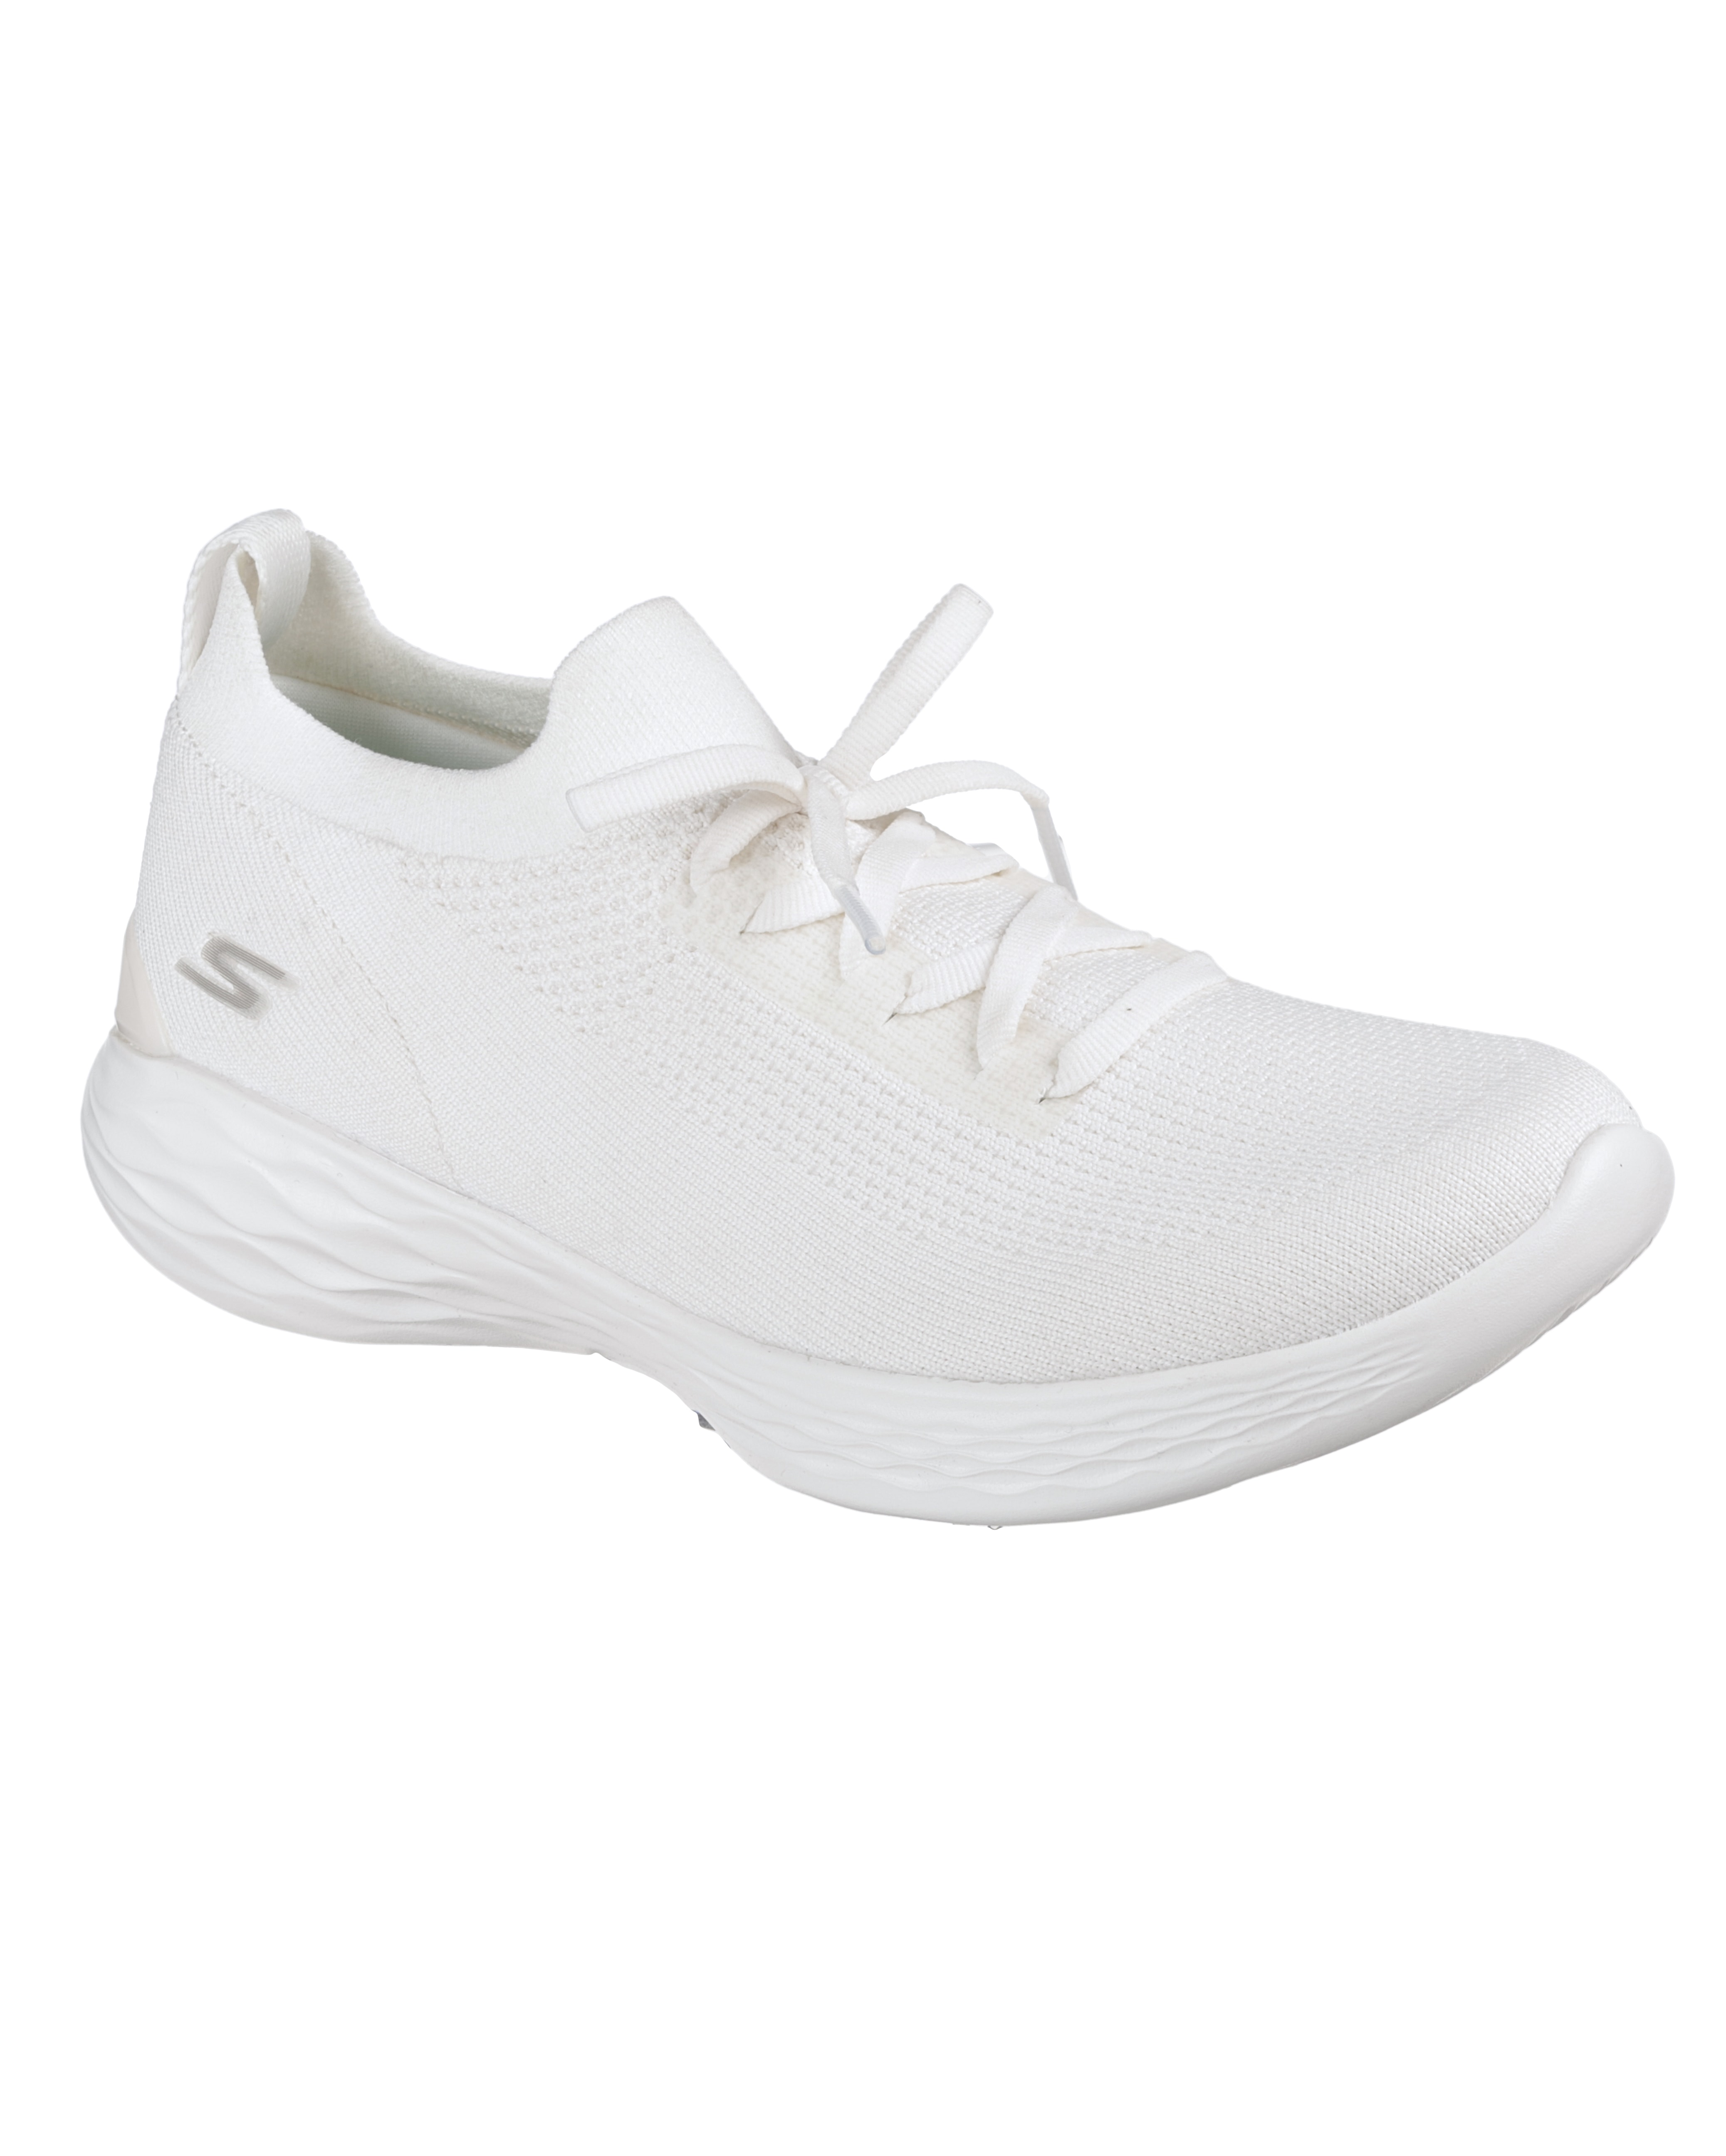 Skechers Womens You Shine - White